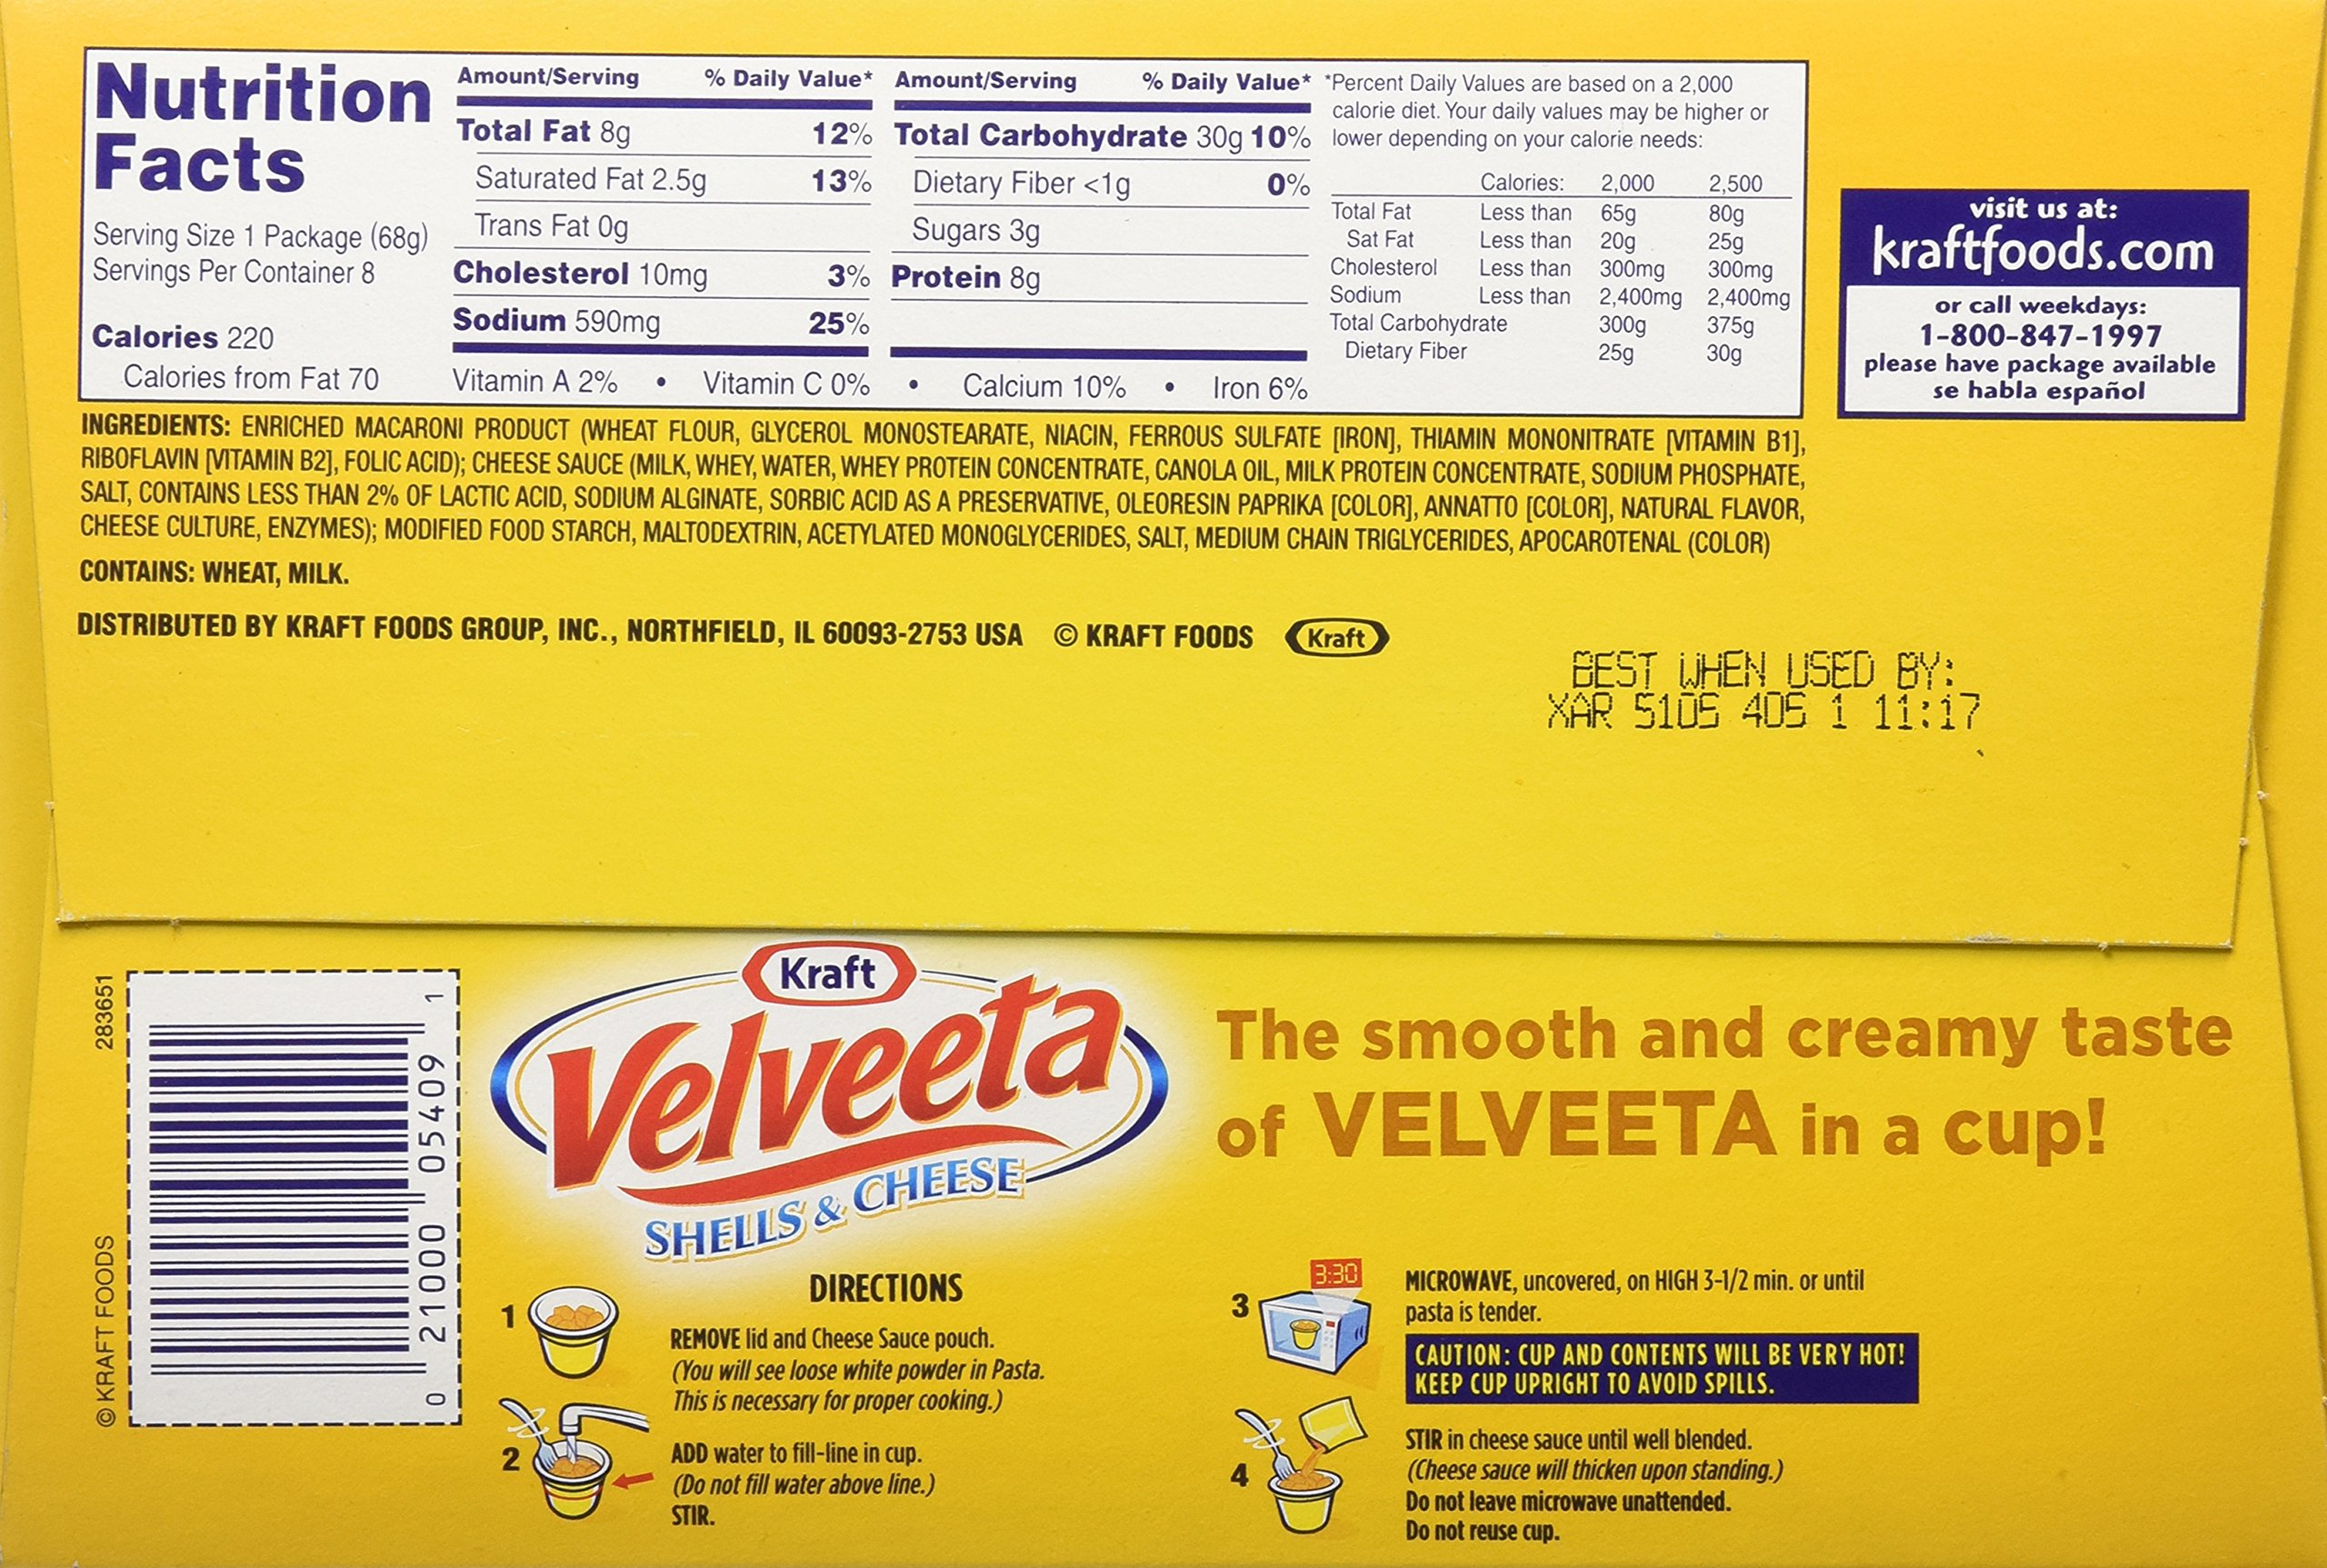 Velveeta Shells and Cheese Original Single Serve Cups, 2.39 Ounce, 8 Count by Velveeta